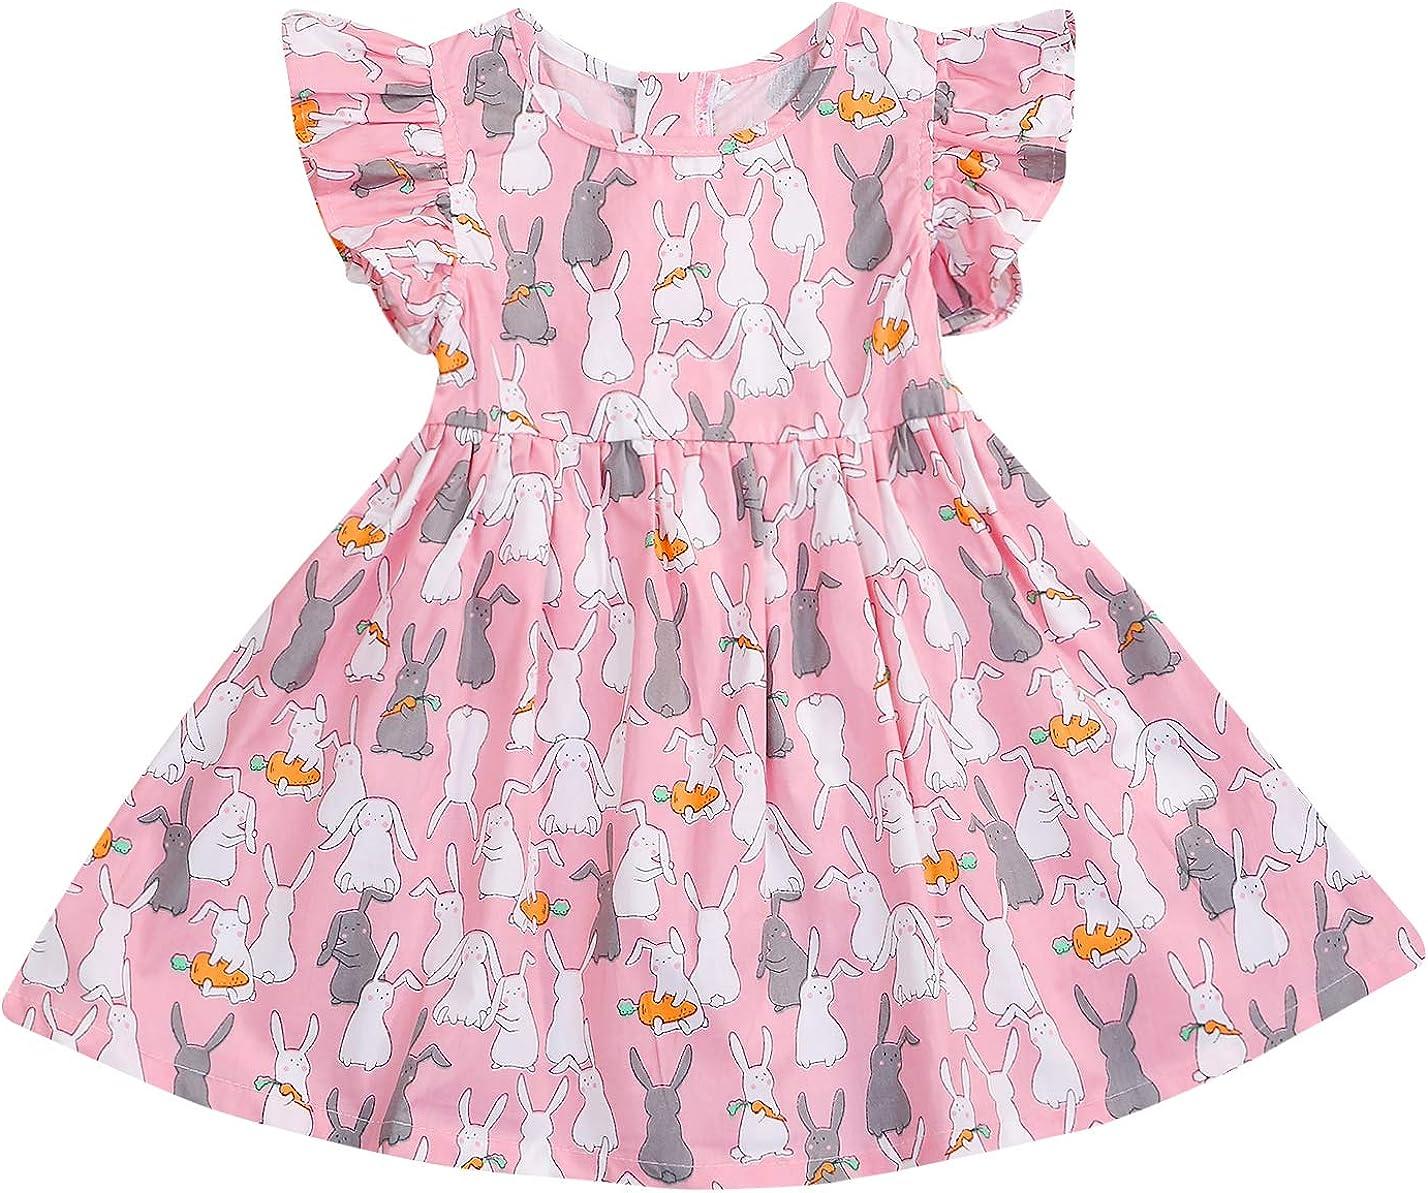 YOUNGER STAR Toddler Kids Baby Girl Skirt Summer Short Sleeve Princess Dress Clothes Outfits Light Pink